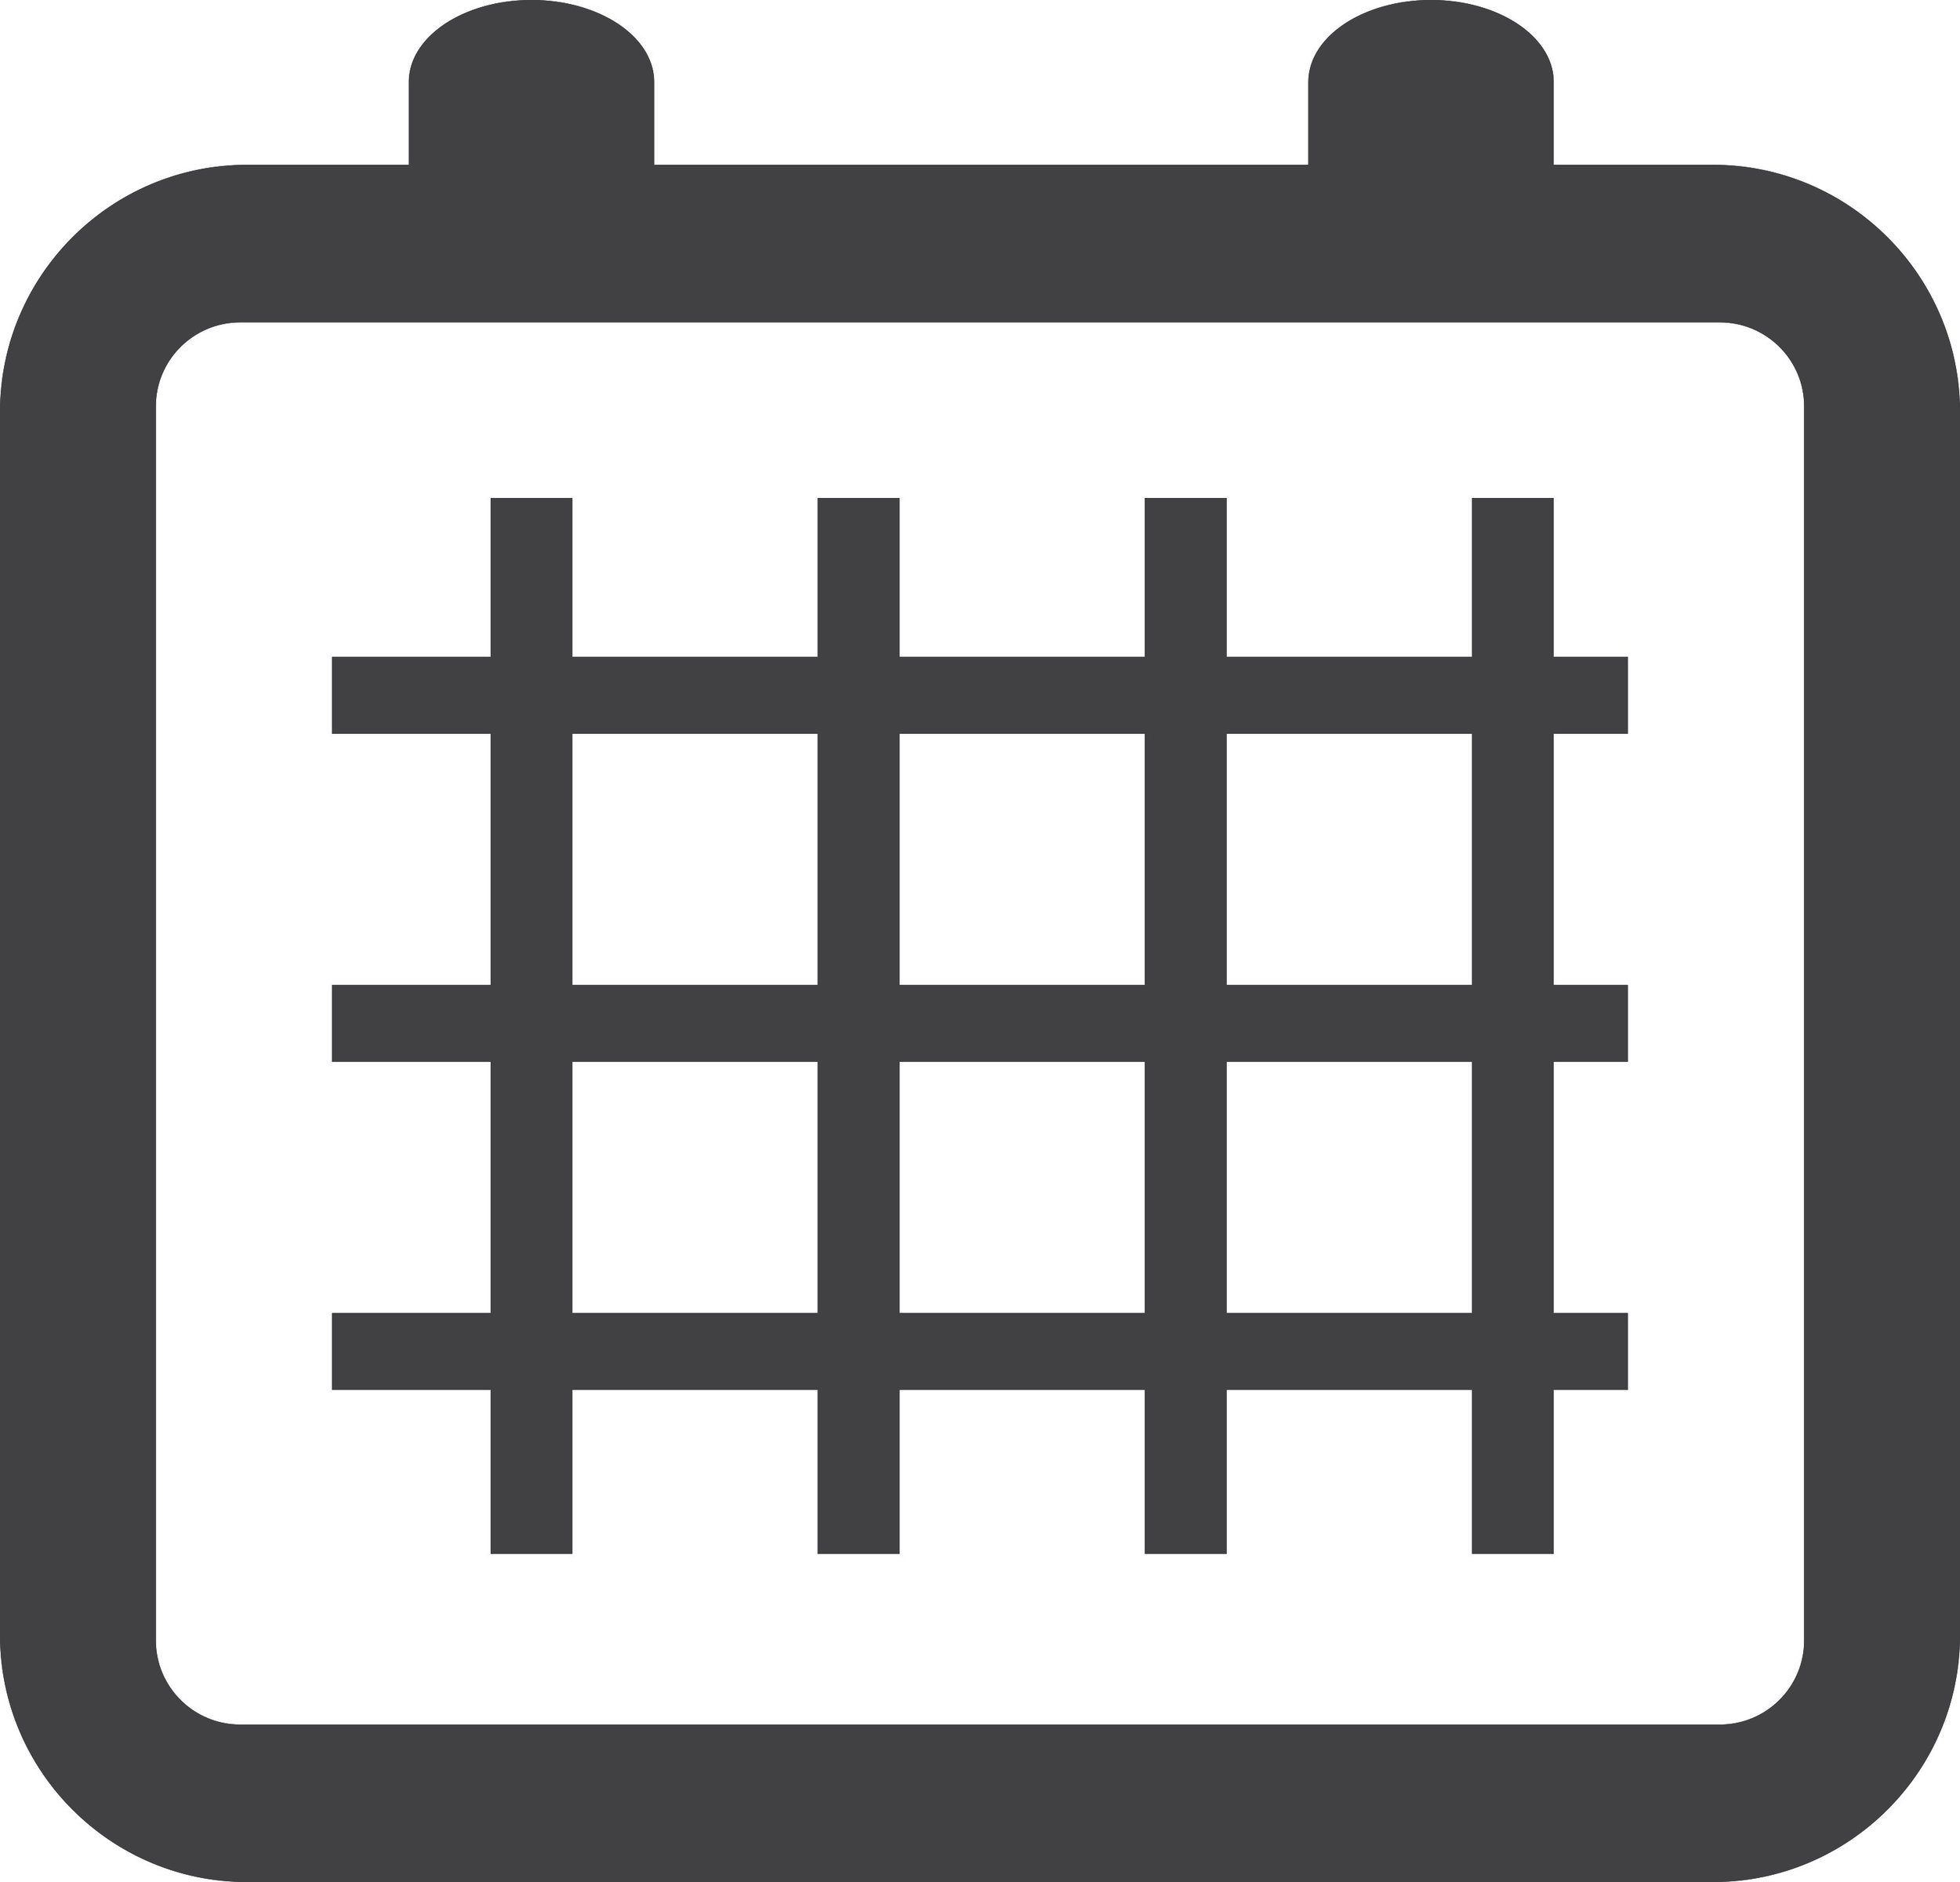 2020 2021 Traditional School Calendar Feedback Request — Team CCS